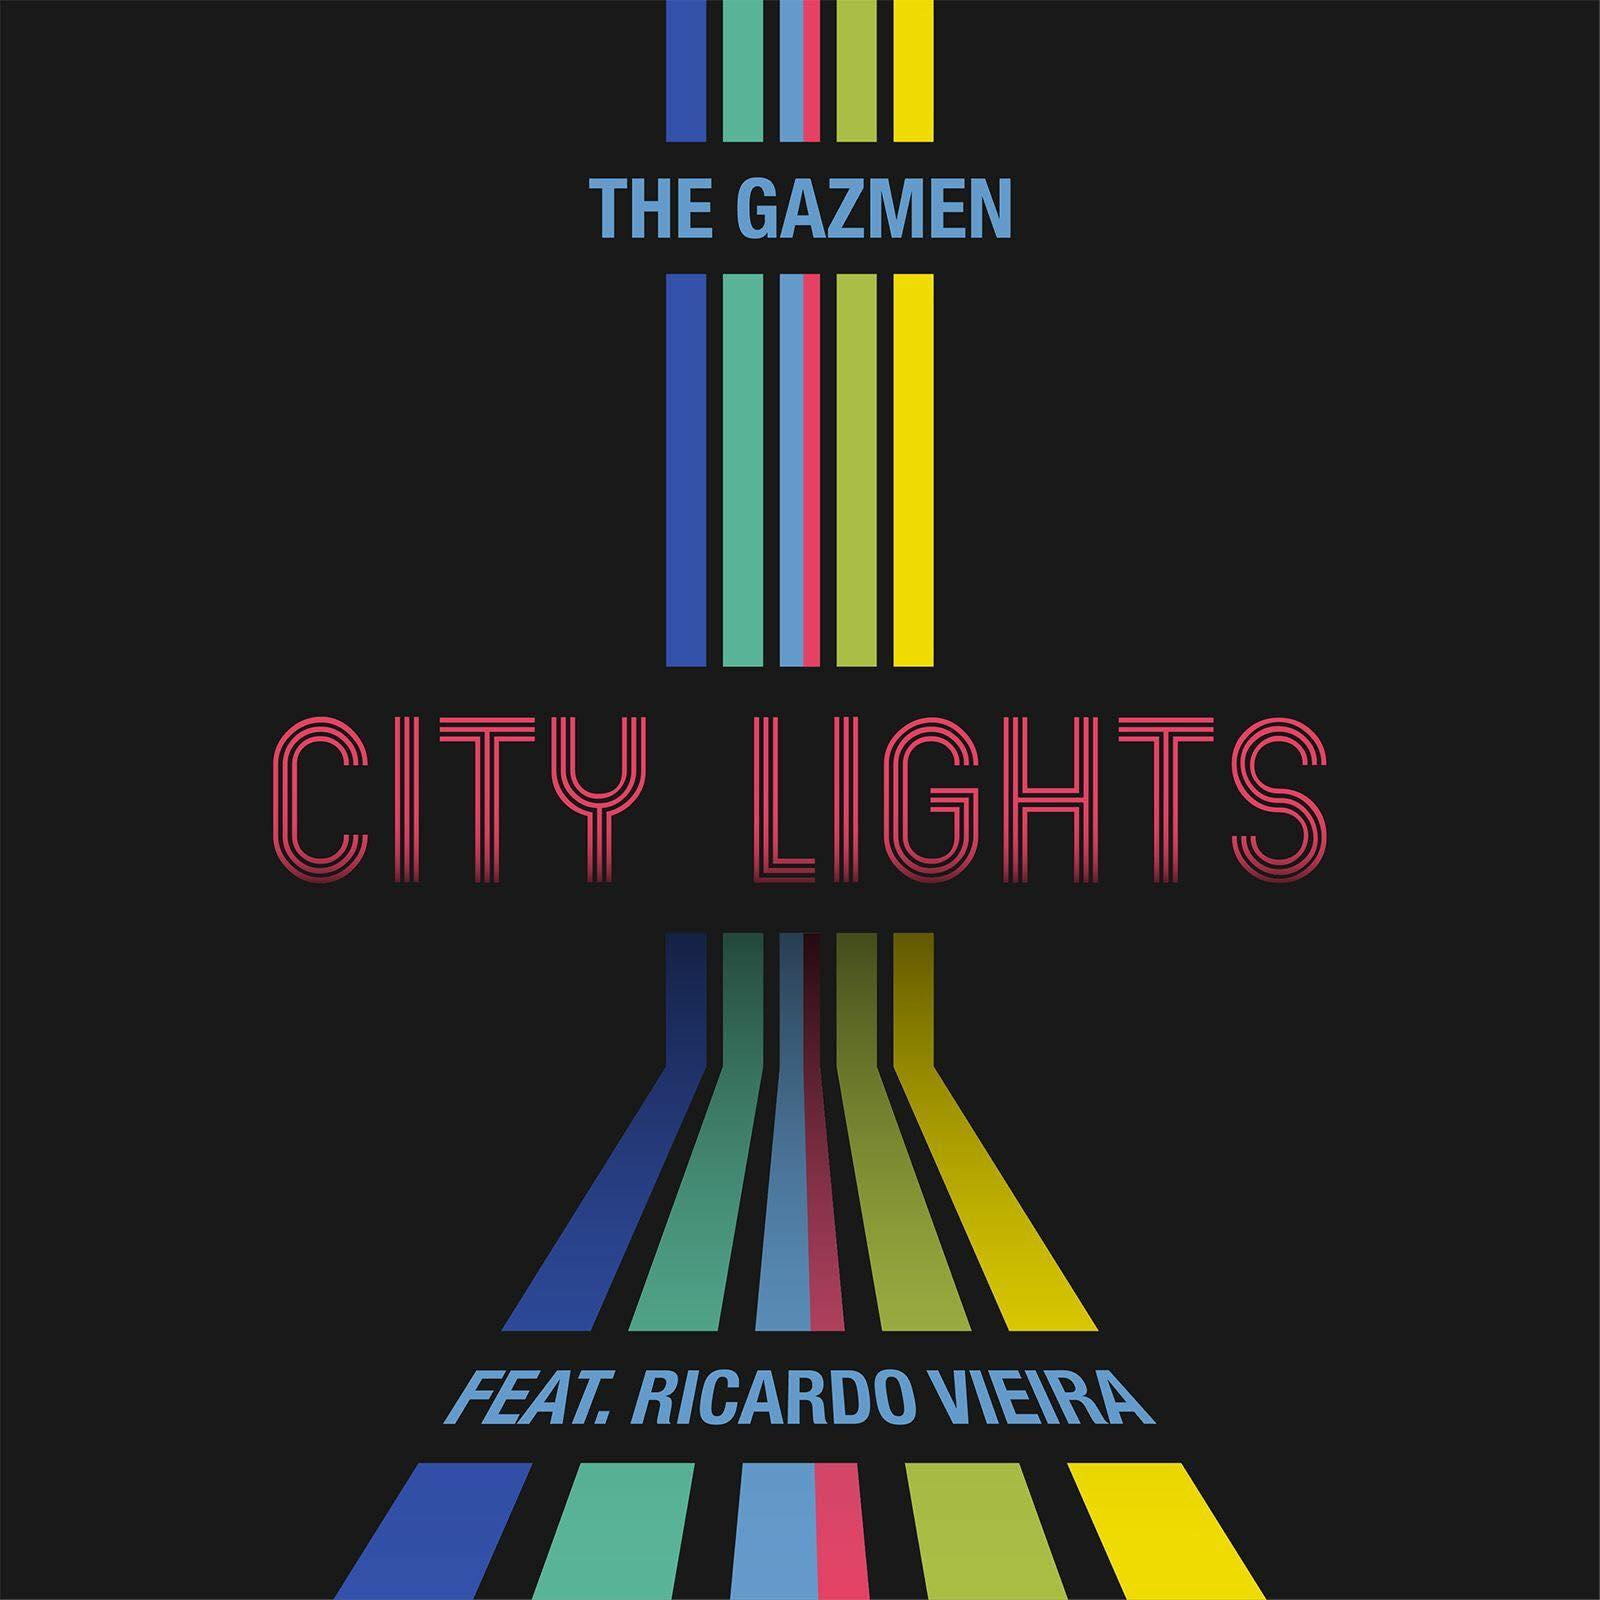 'CITY LIGHTS by THE GAZMEN out now! Vote on ELDORADIO Chartbreaker:   http://www.eldo.lu/music/charts/chartbreaker/vote/#41